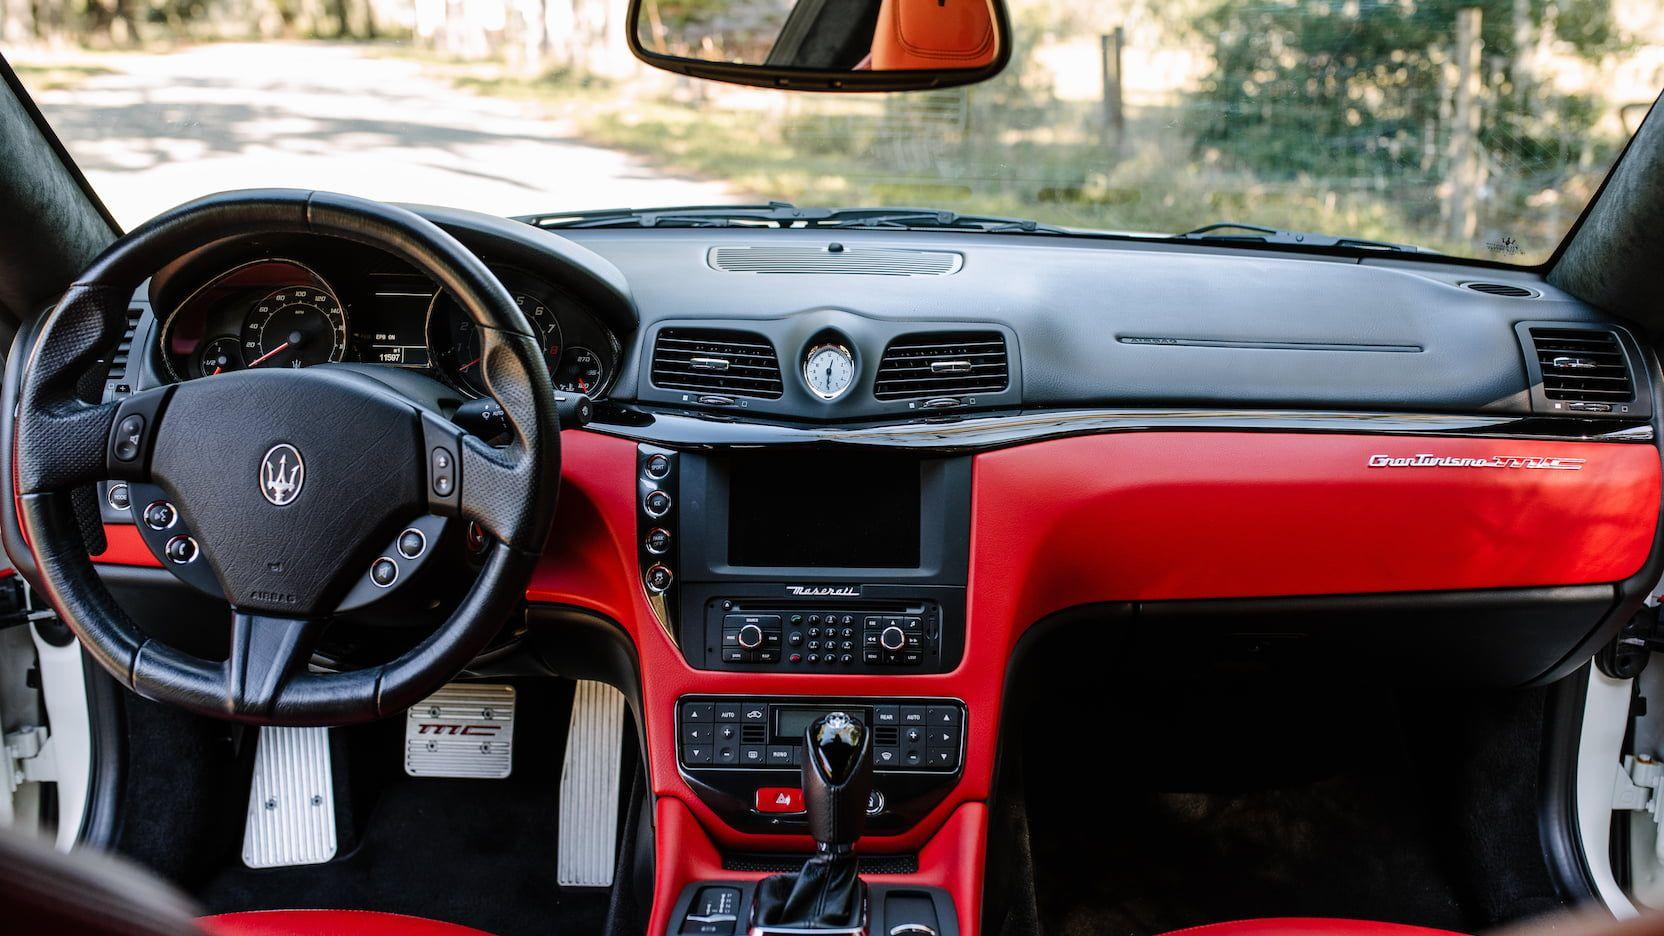 2013 Maserati GranTurismo MC Stradale W156 Kissimmee